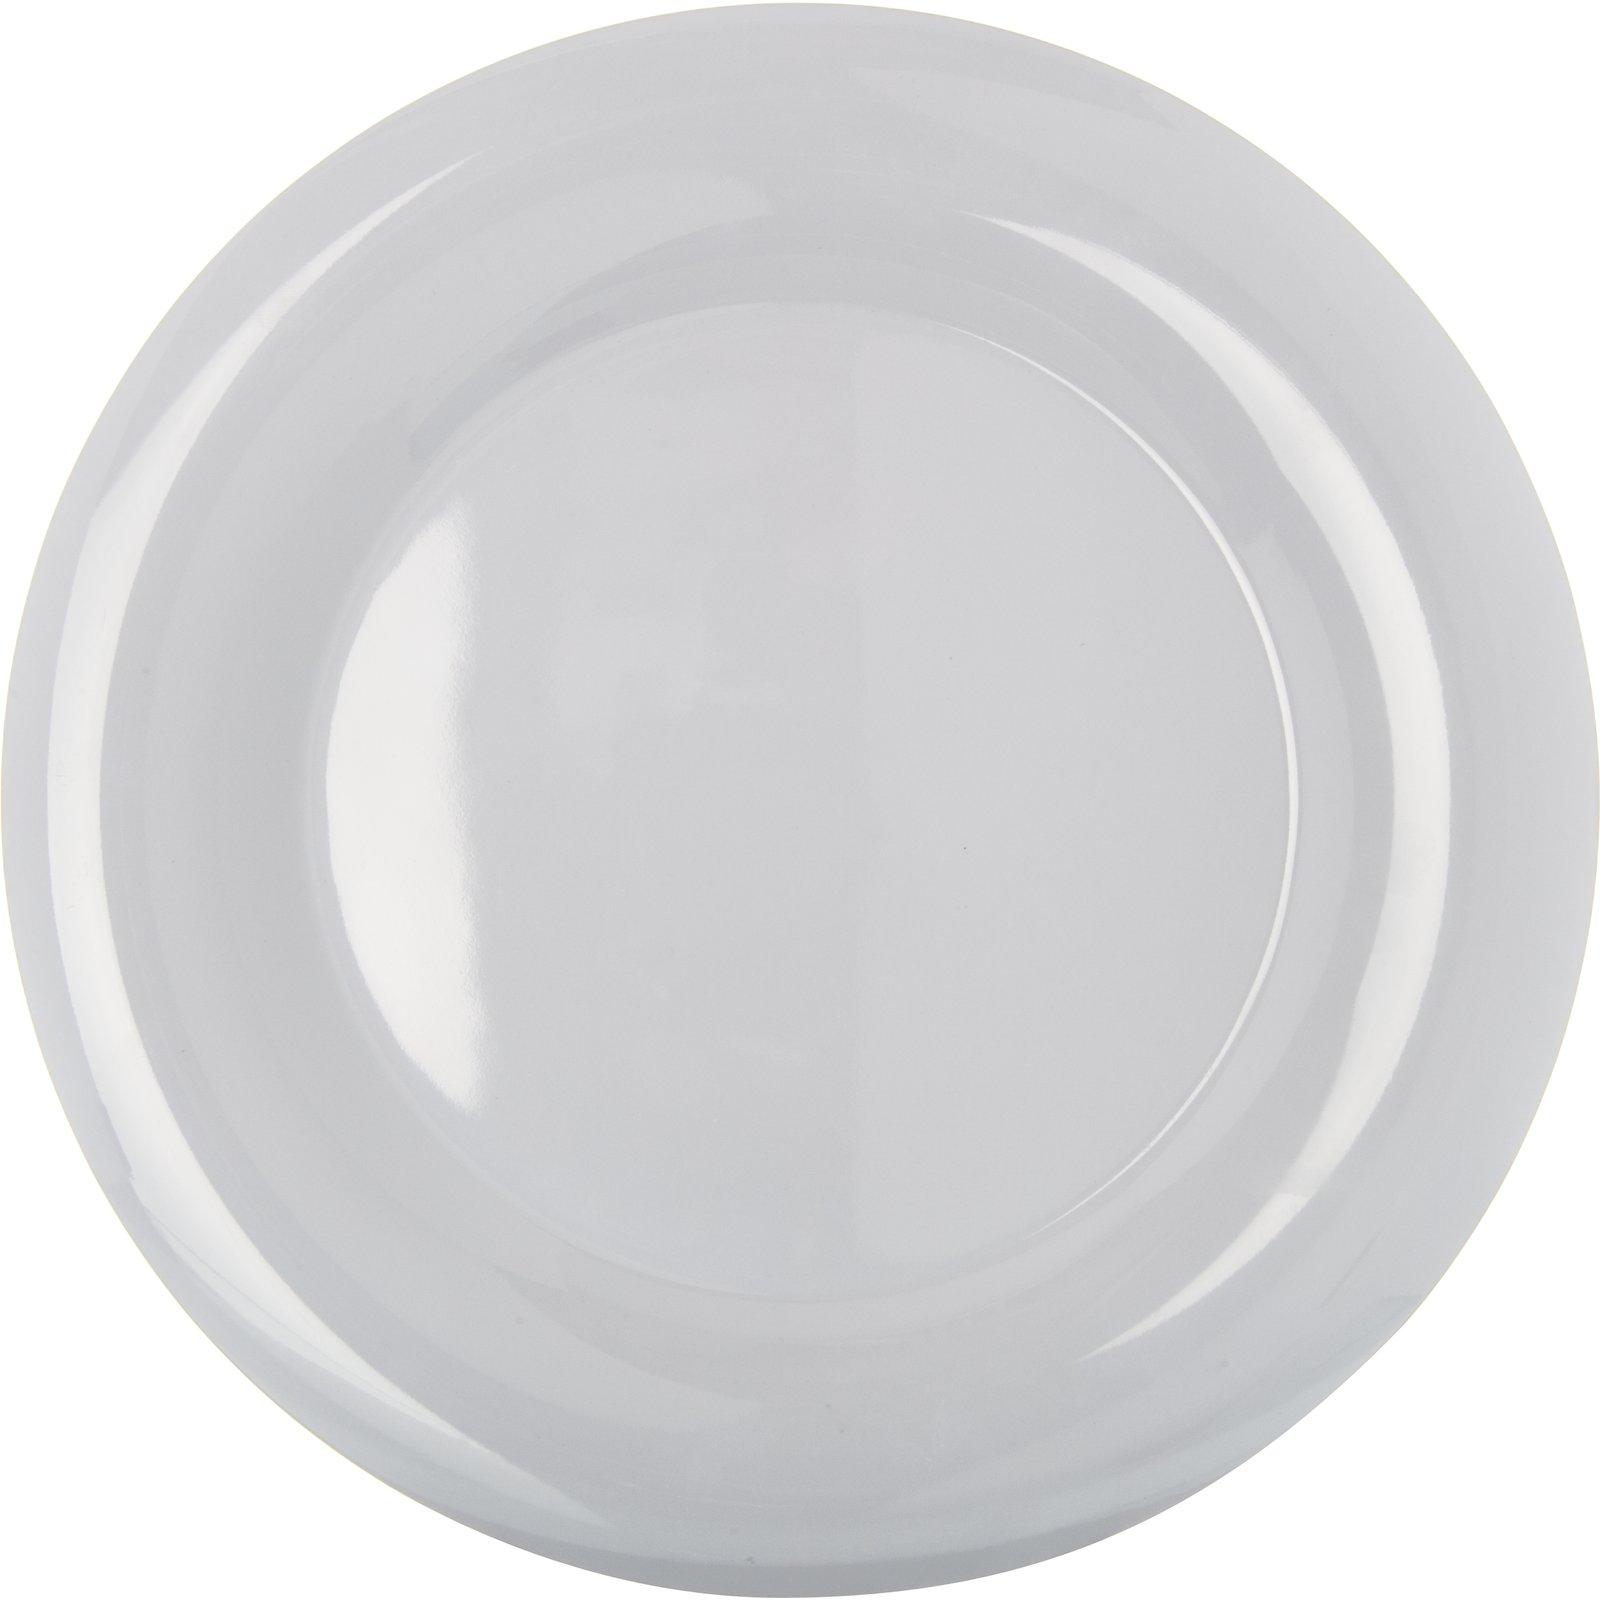 ... 4302402 - Durus® Melamine Wide Rim Round Plate 12  - White  sc 1 st  Carlisle FoodService Products & 4302402 - Durus® Melamine Wide Rim Round Plate 12